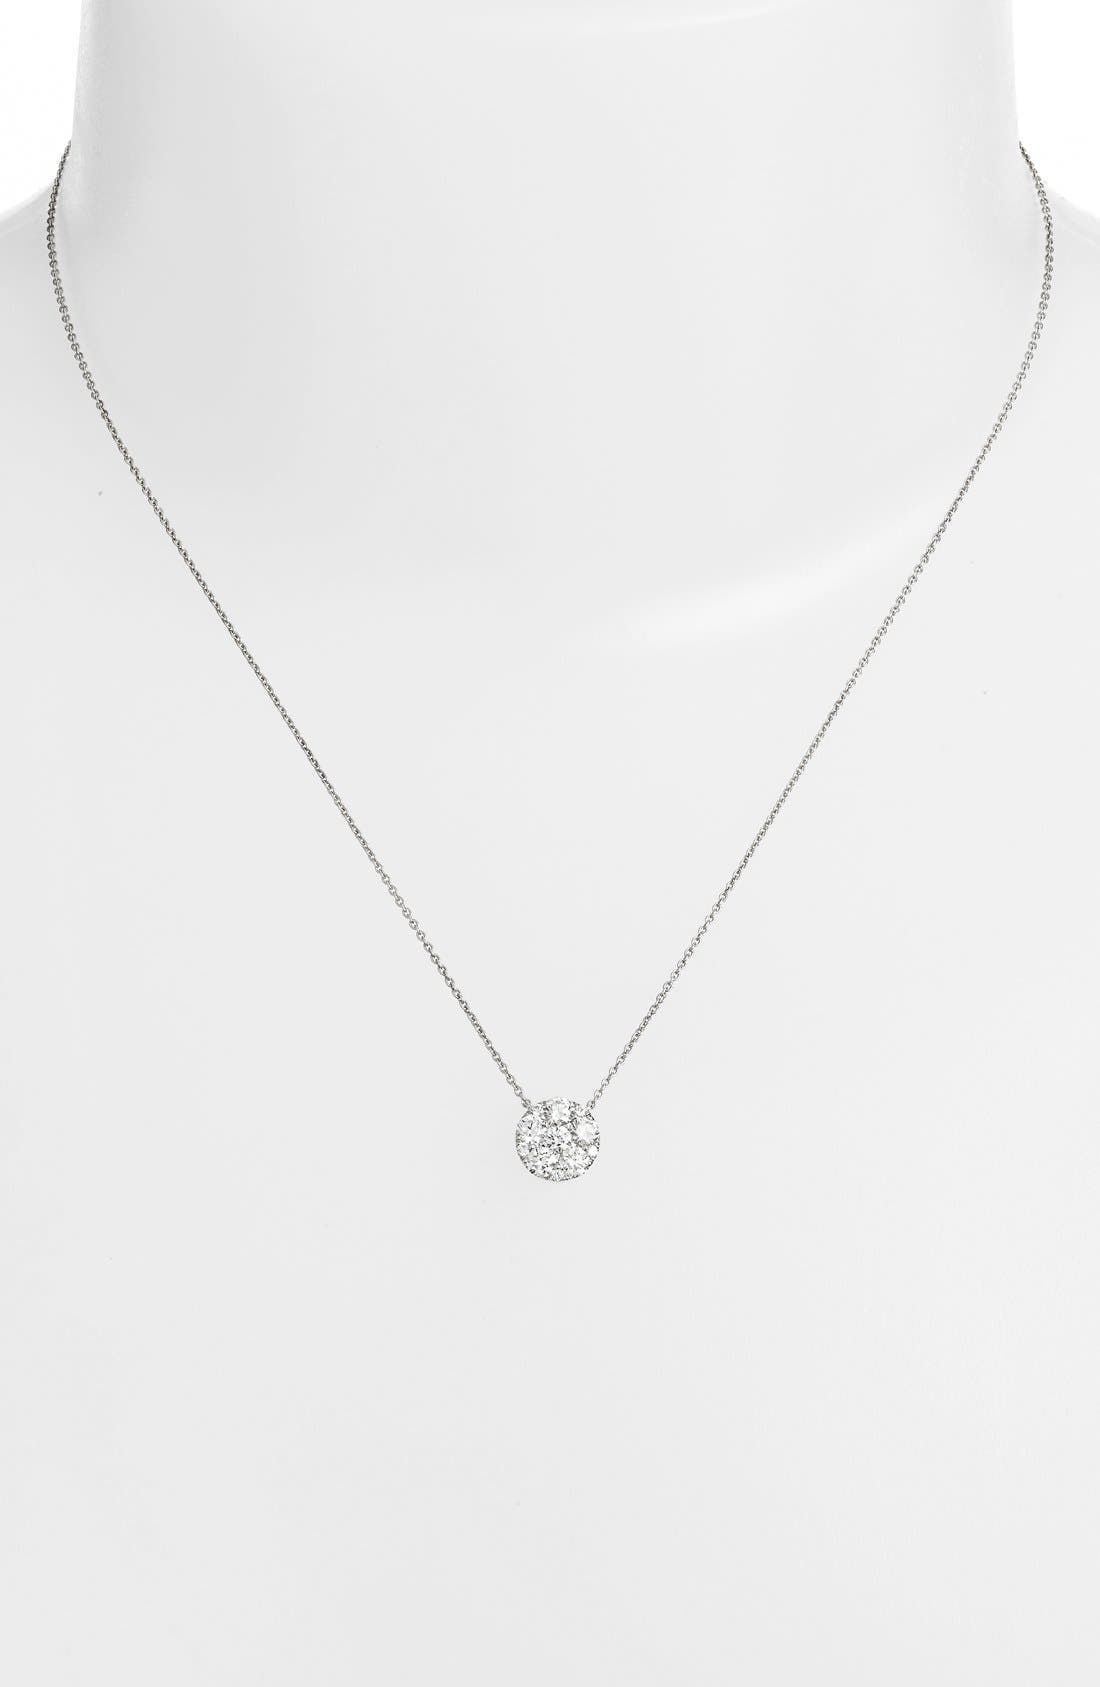 Alternate Image 2  - Bony Levy 'Mika' Pavé Diamond Large Circle Pendant Necklace (Nordstrom Exclusive)